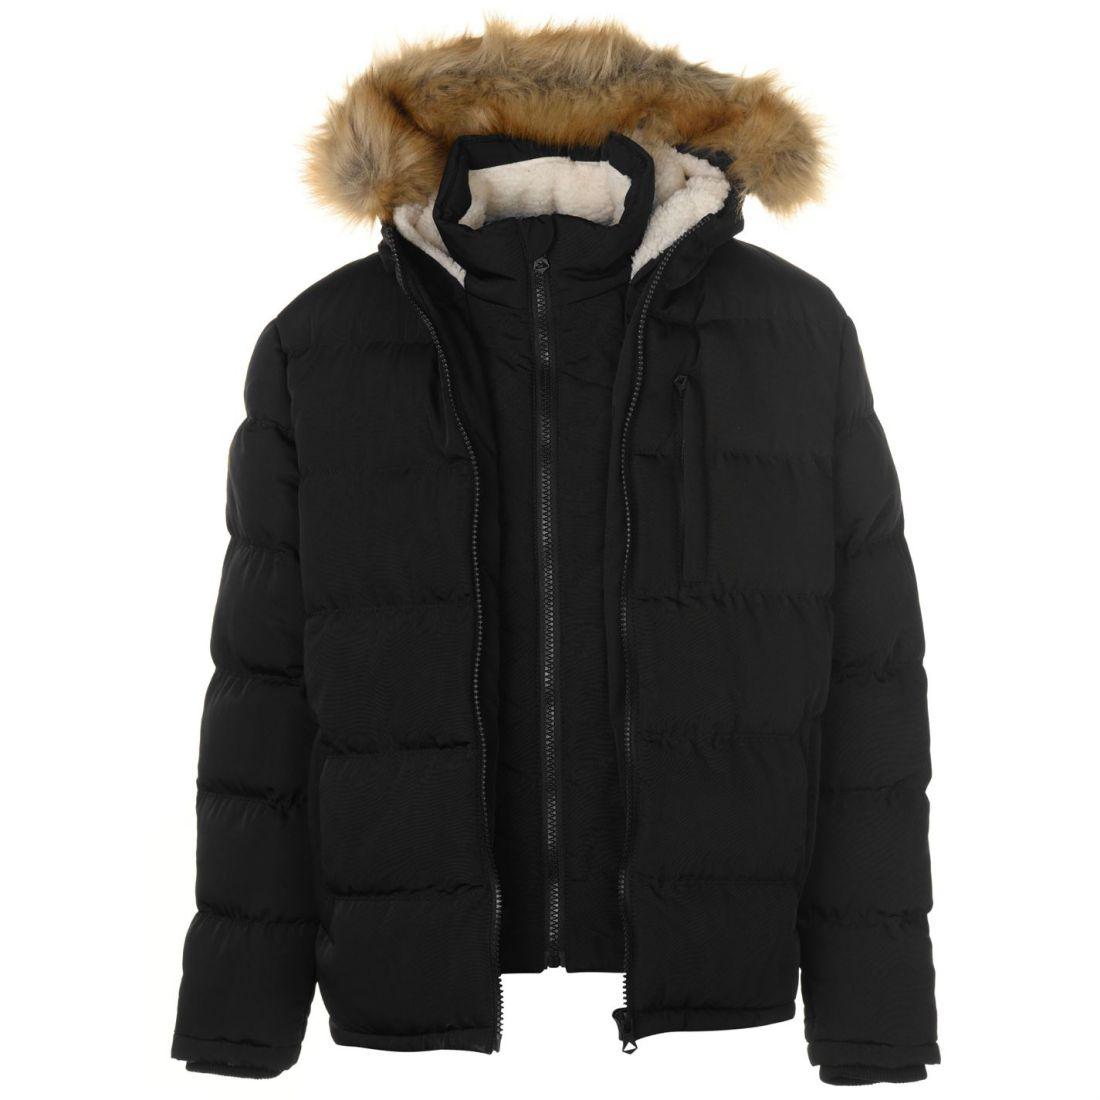 322f849a SoulCal Mens 2 Zip Bubble Jacket Padded Coat Top Warm Fur Trim Faux ...